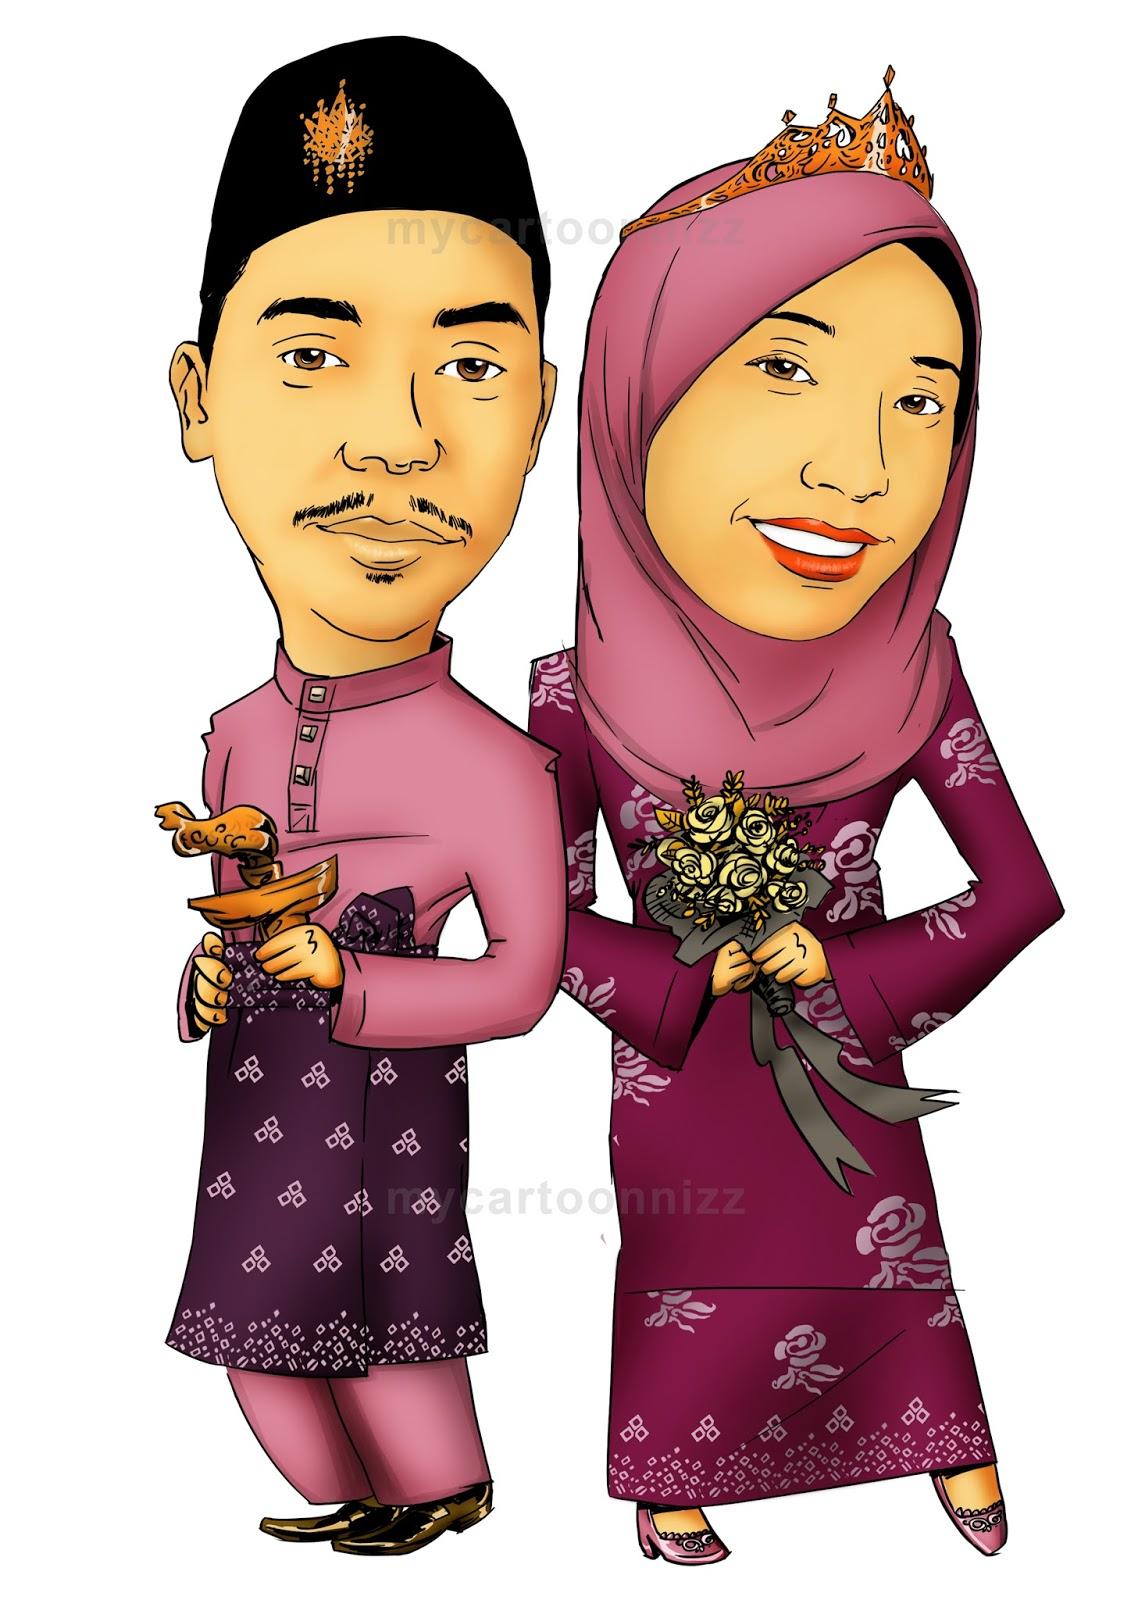 mycartoonnizz Norasyiqin Baharuddin Kemaman Terengganu